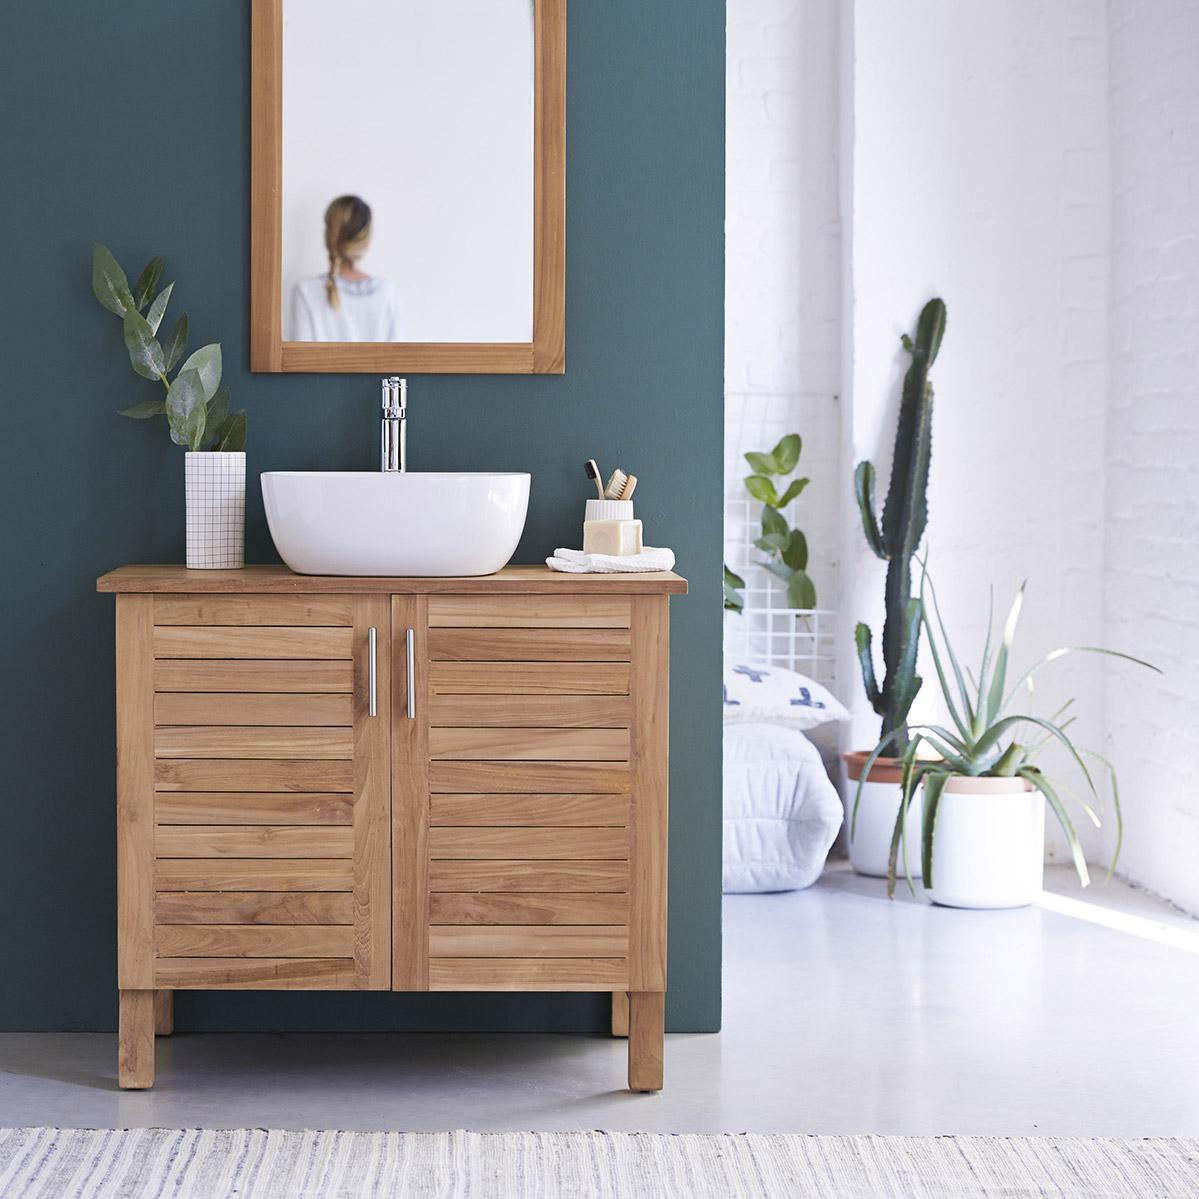 Meuble simple vasque l.16 x H.16 x P.16 cm, teck, Soho